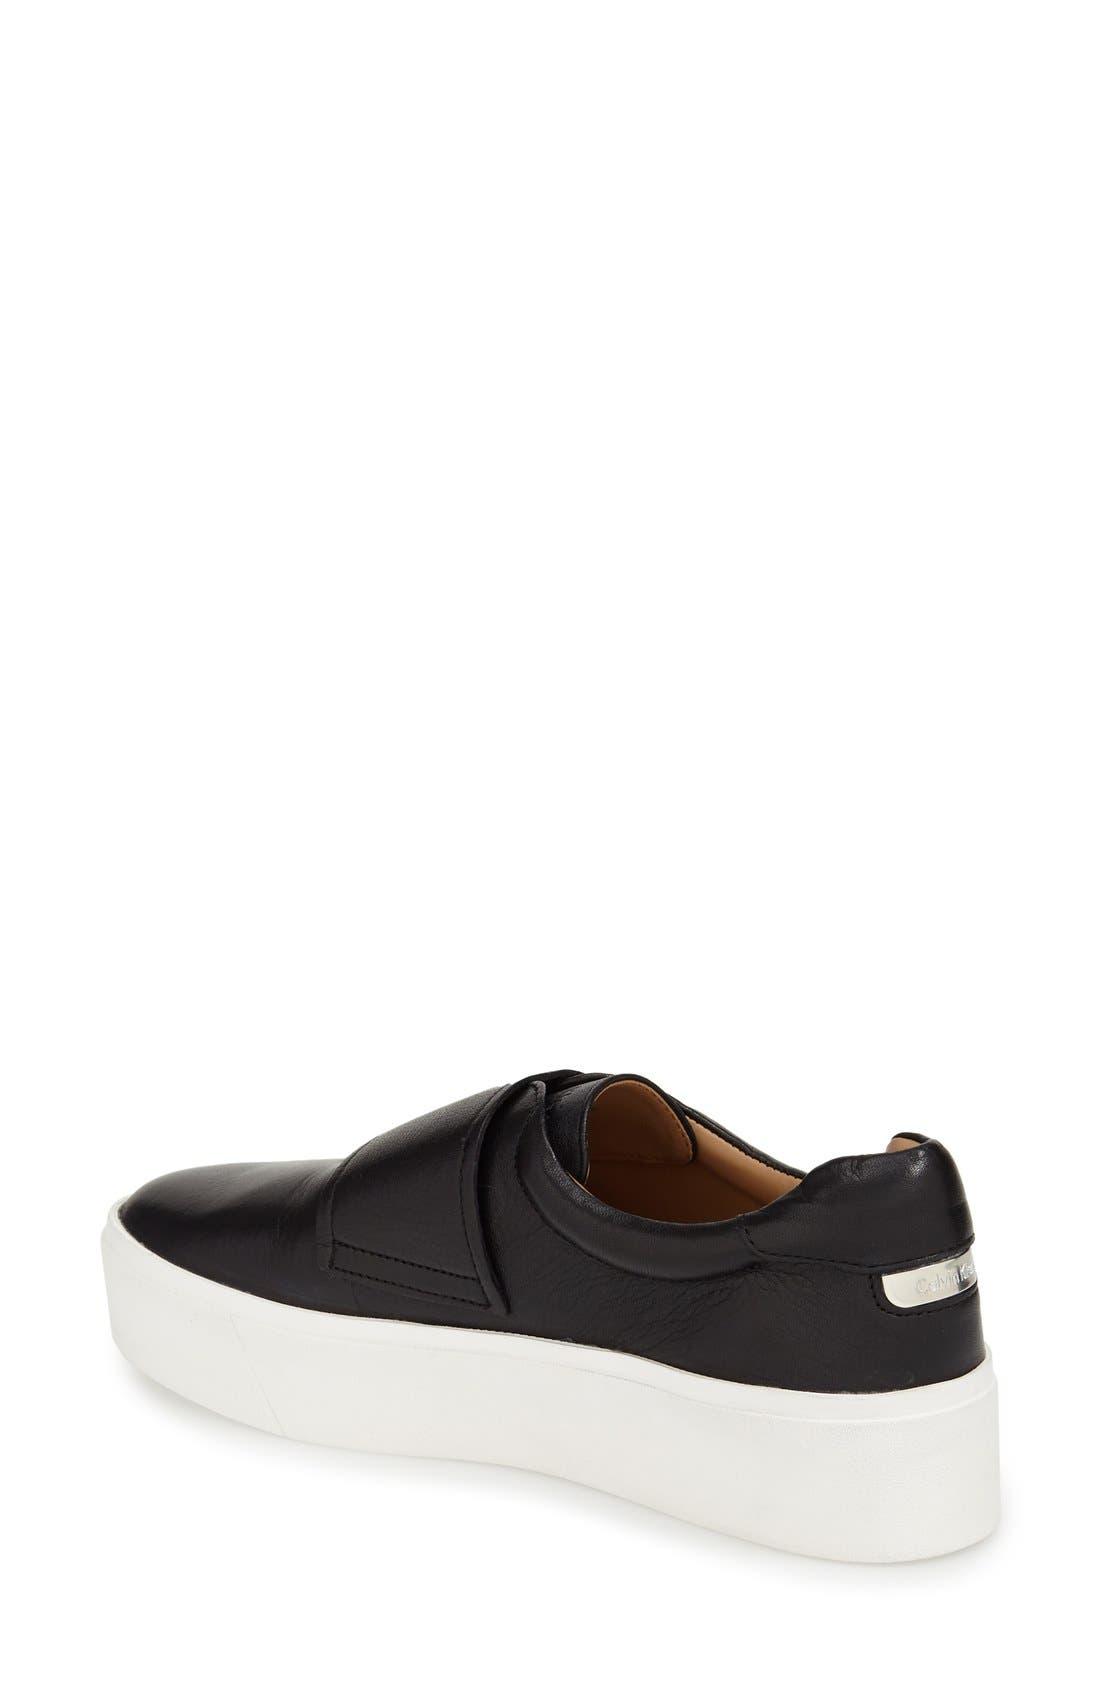 'Jaiden' Platform Sneaker,                             Alternate thumbnail 2, color,                             Black Leather